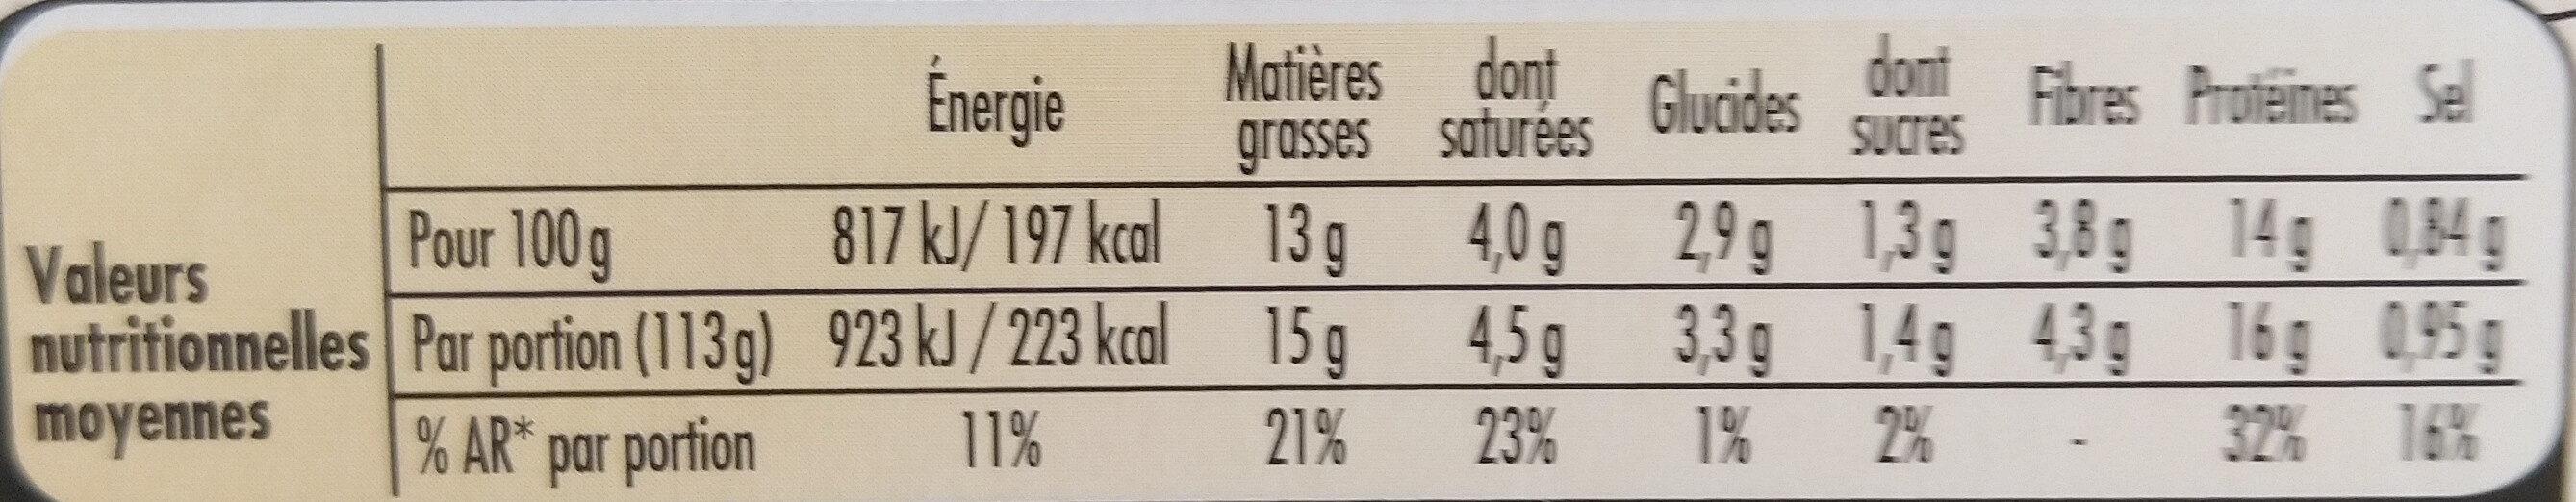 Le bon Végétal Steak cru Soja & Blé - Información nutricional